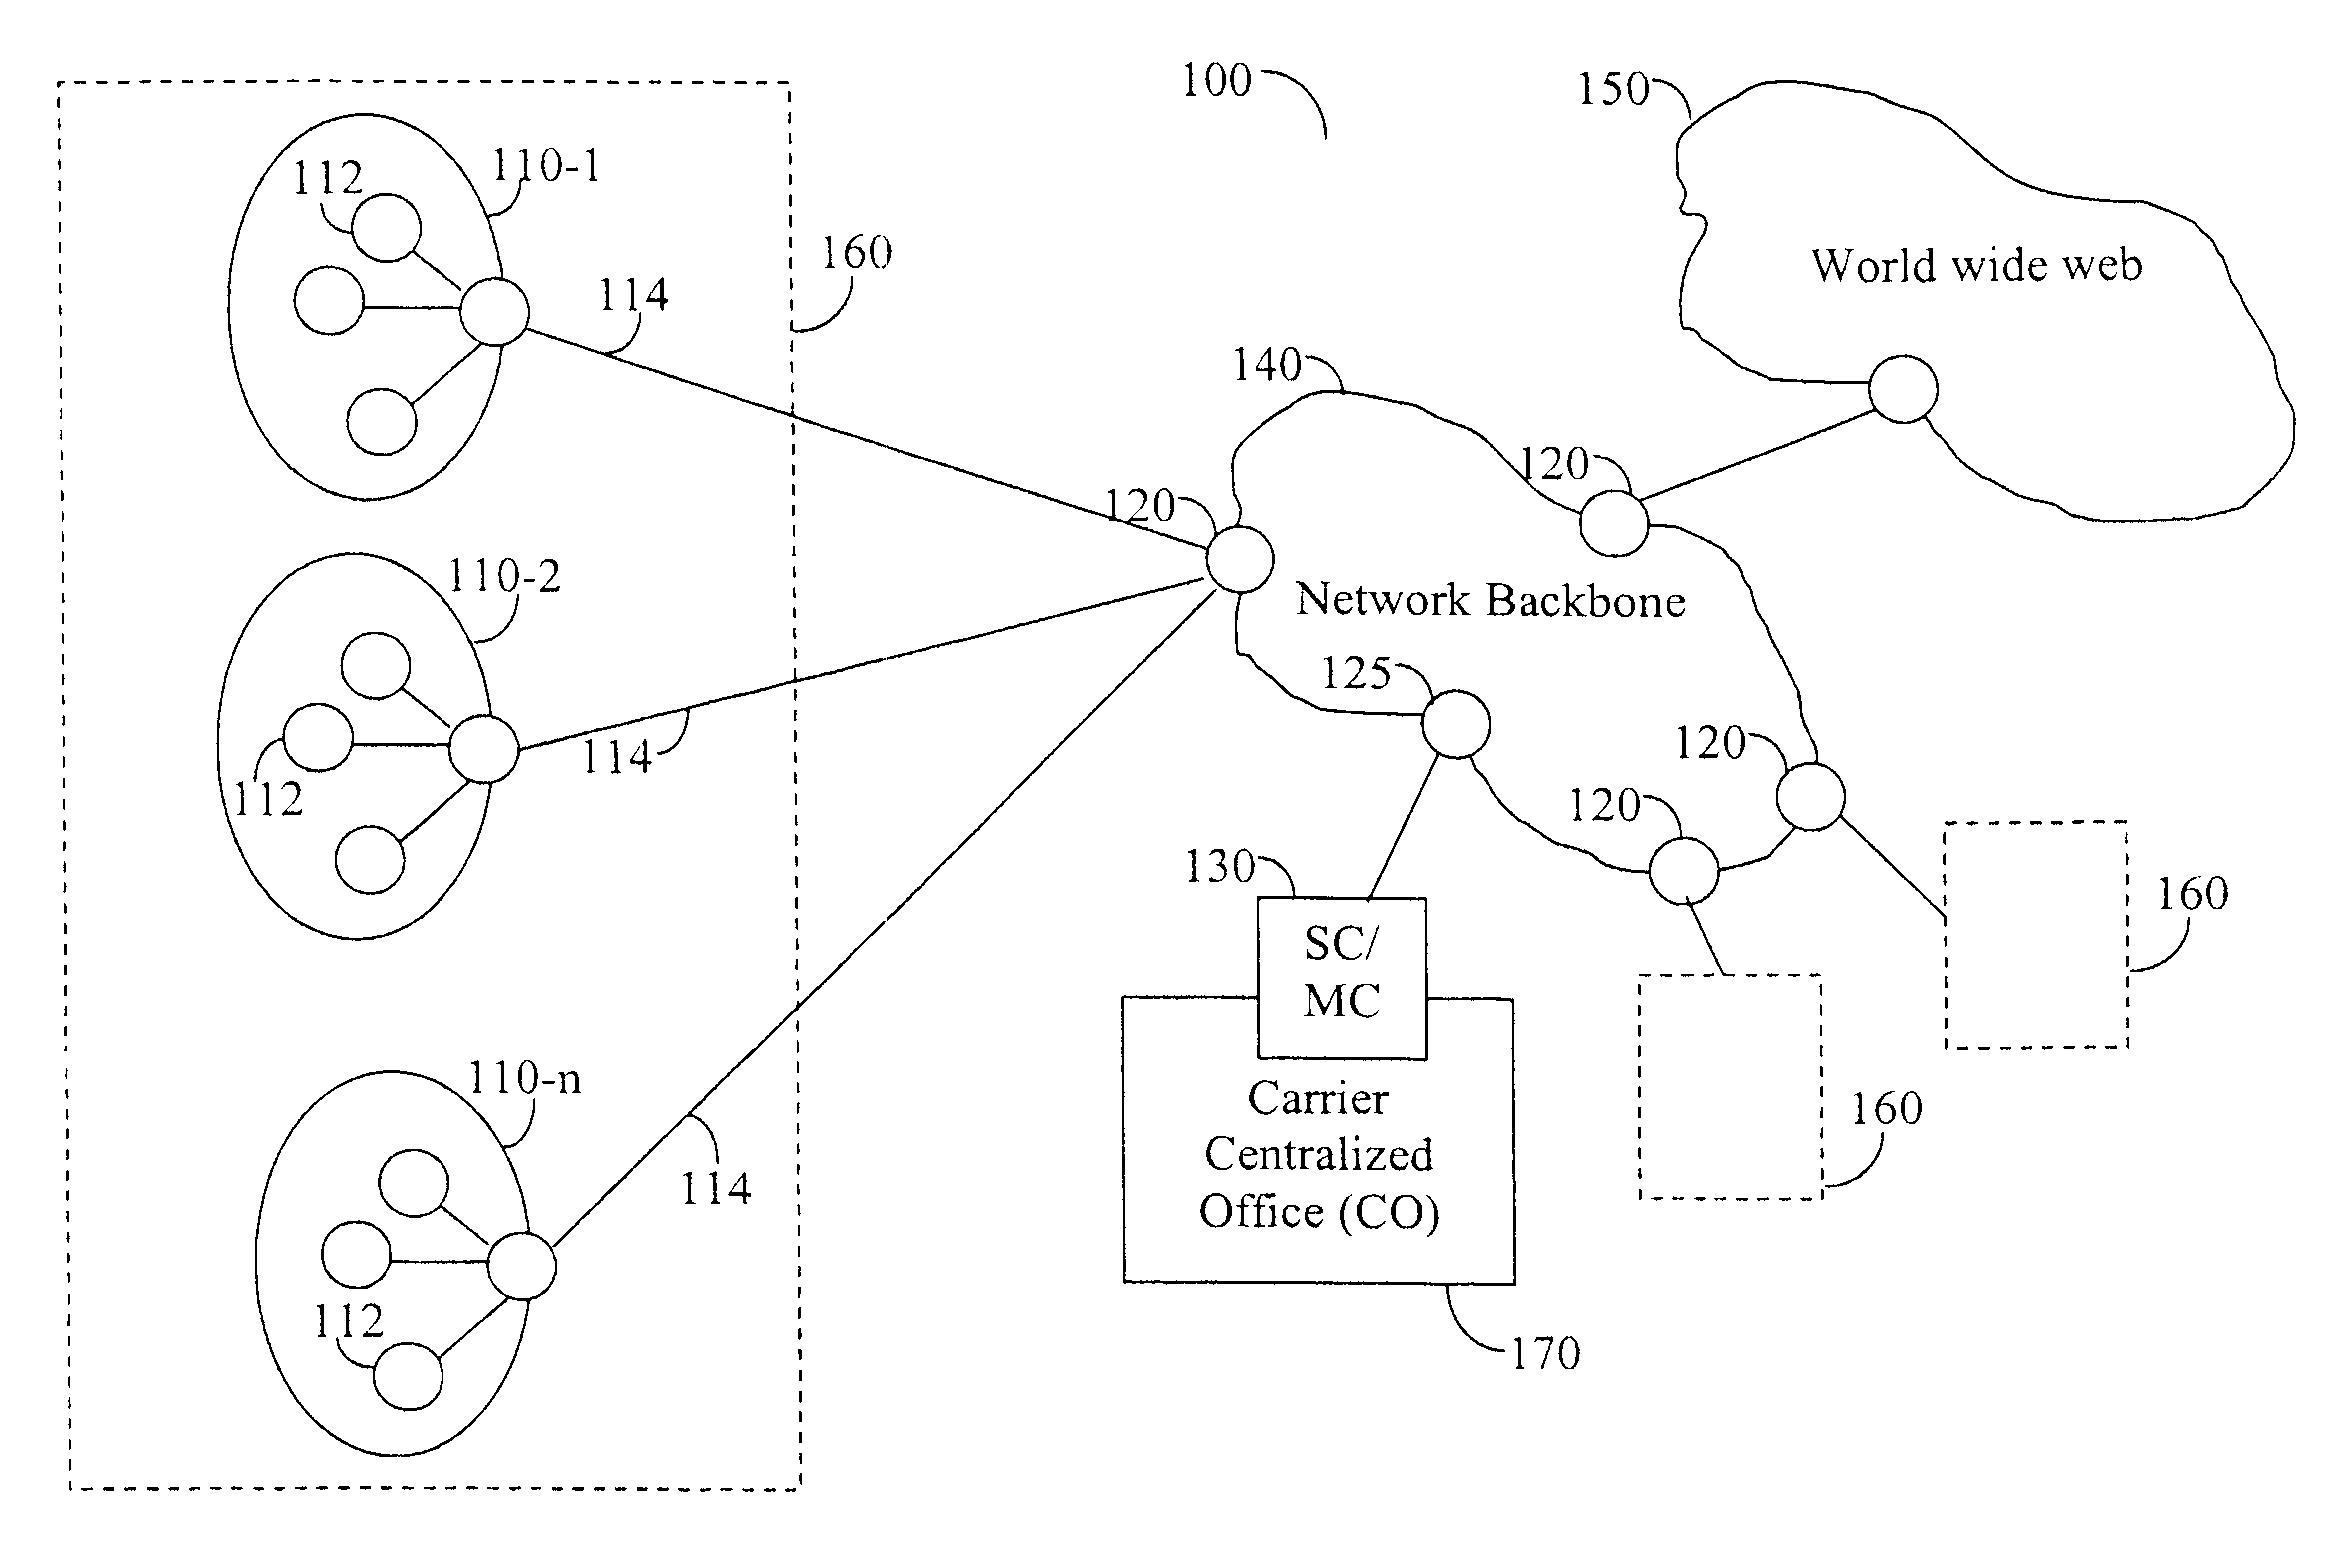 patent us 7 782 897 b1 Speaker Diagram first claim